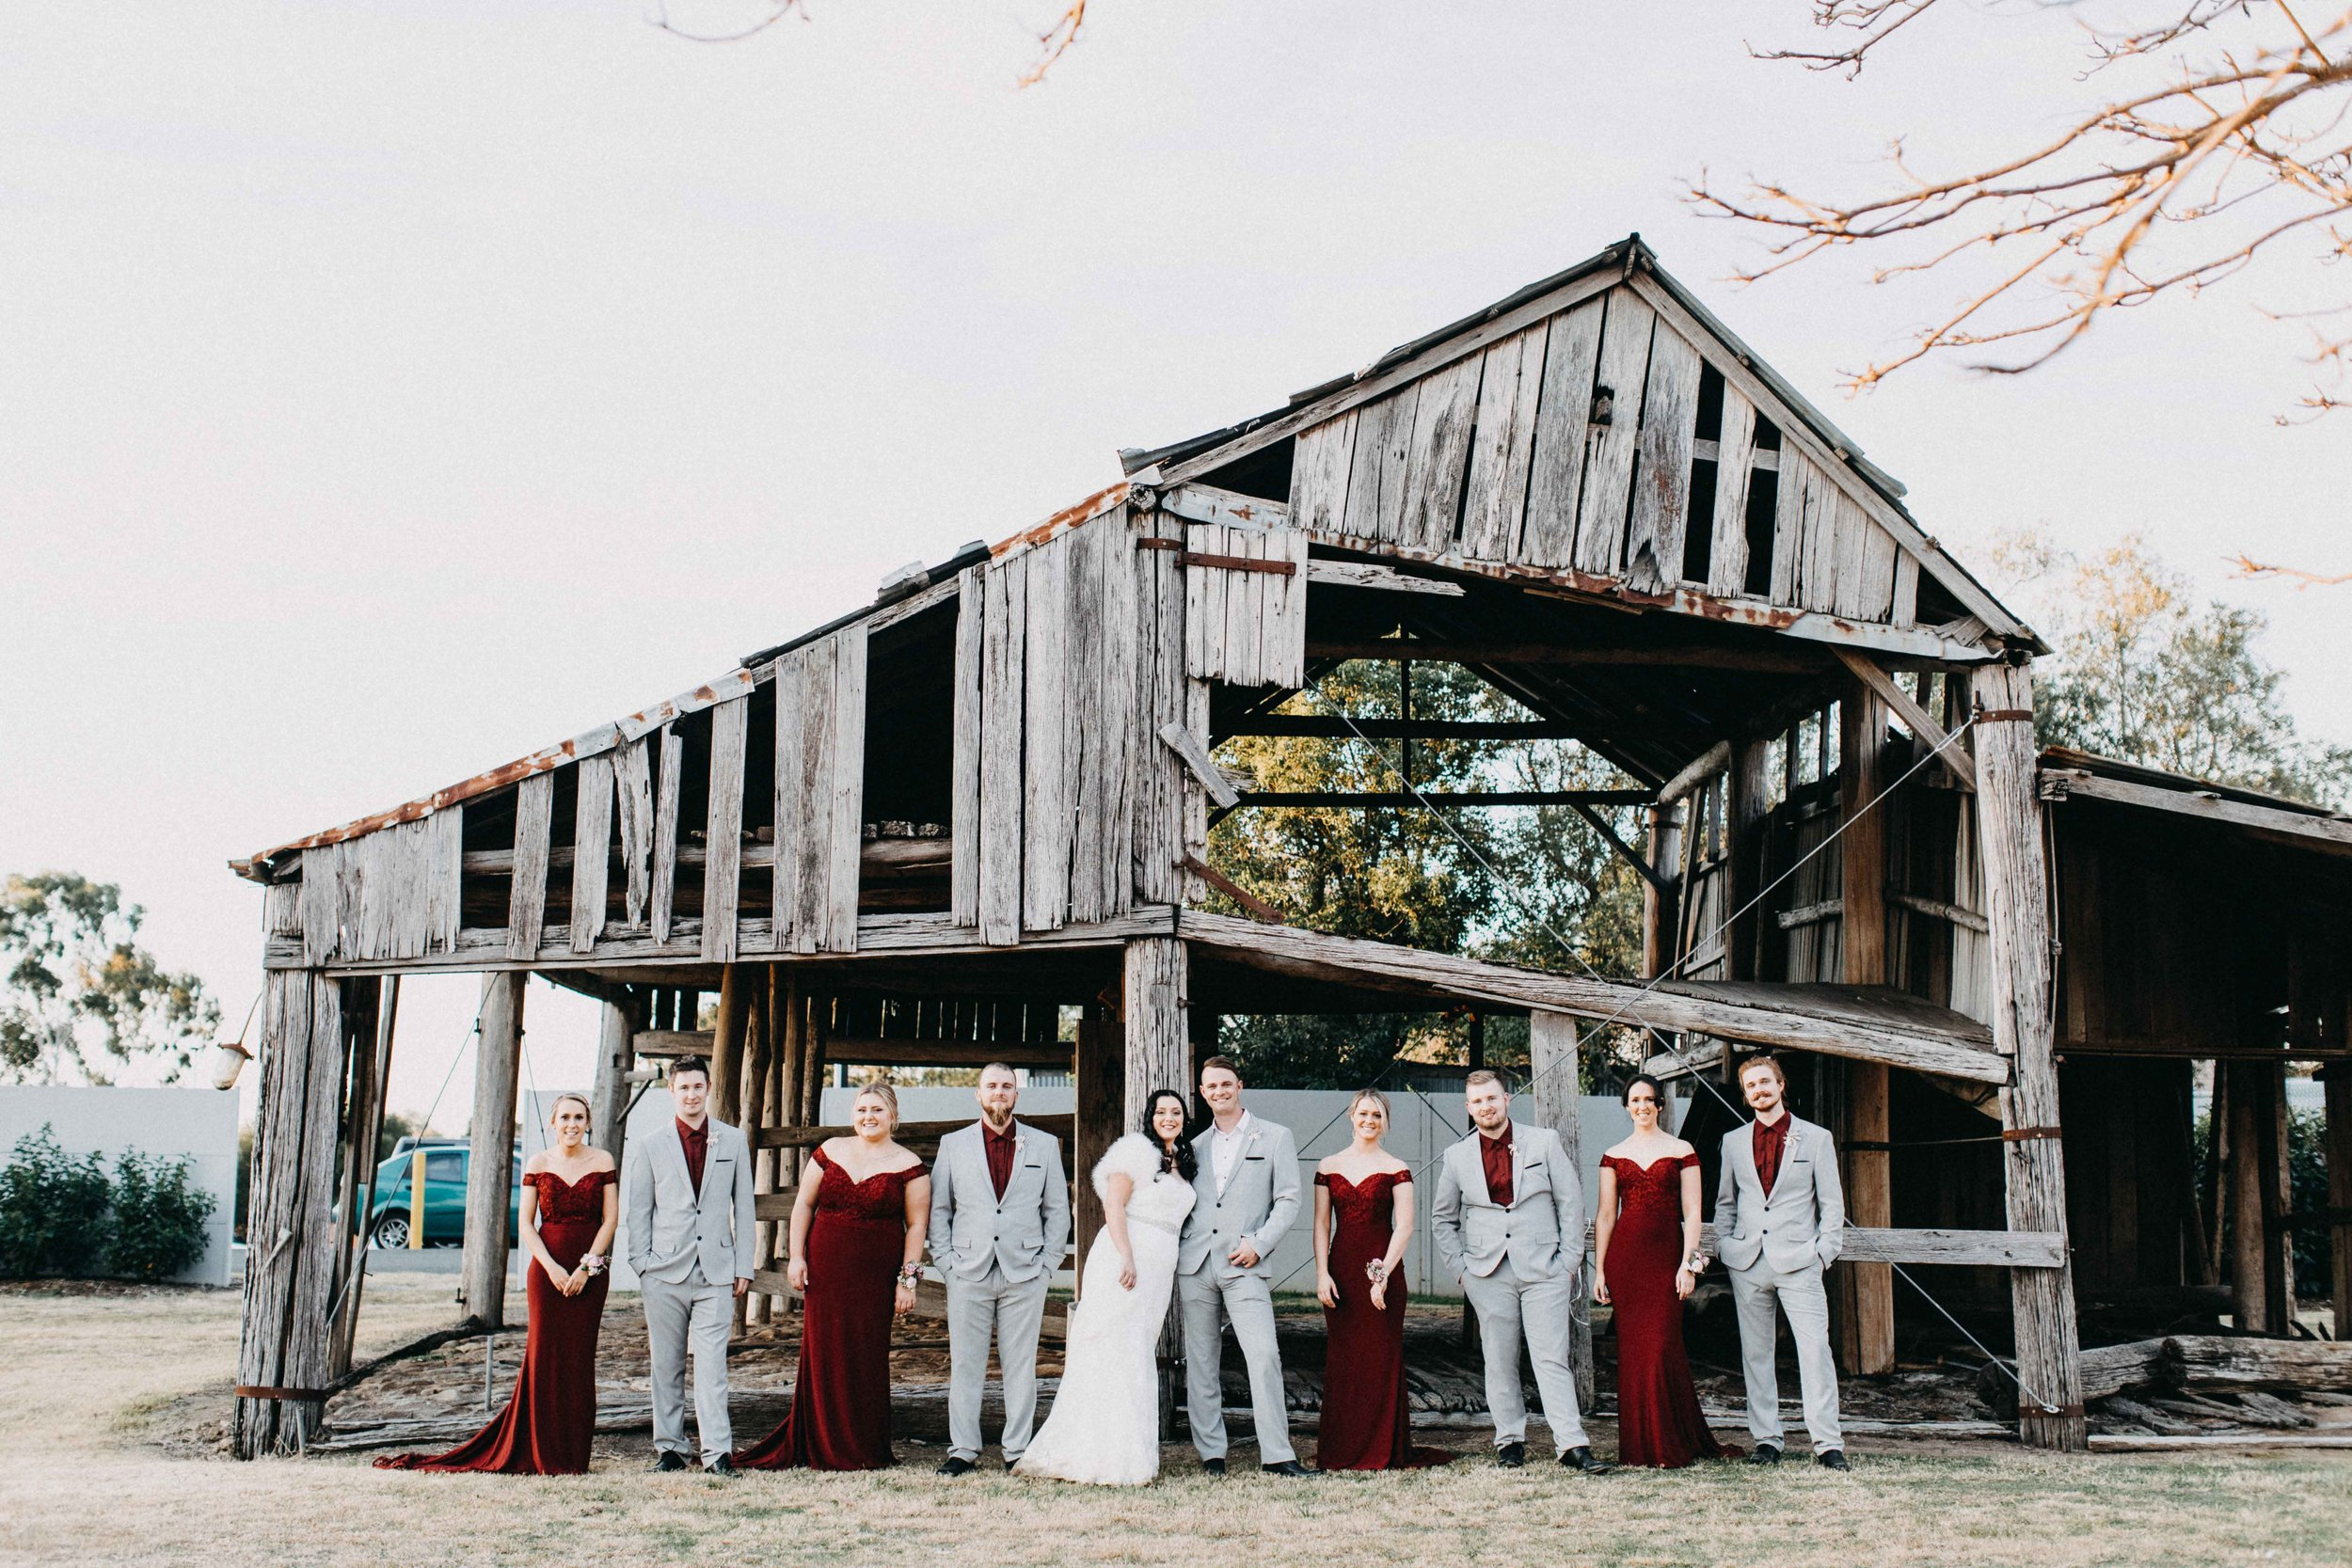 burnham-grove-camden-wedding-emilyobrienphotography-macarthur-131.jpg